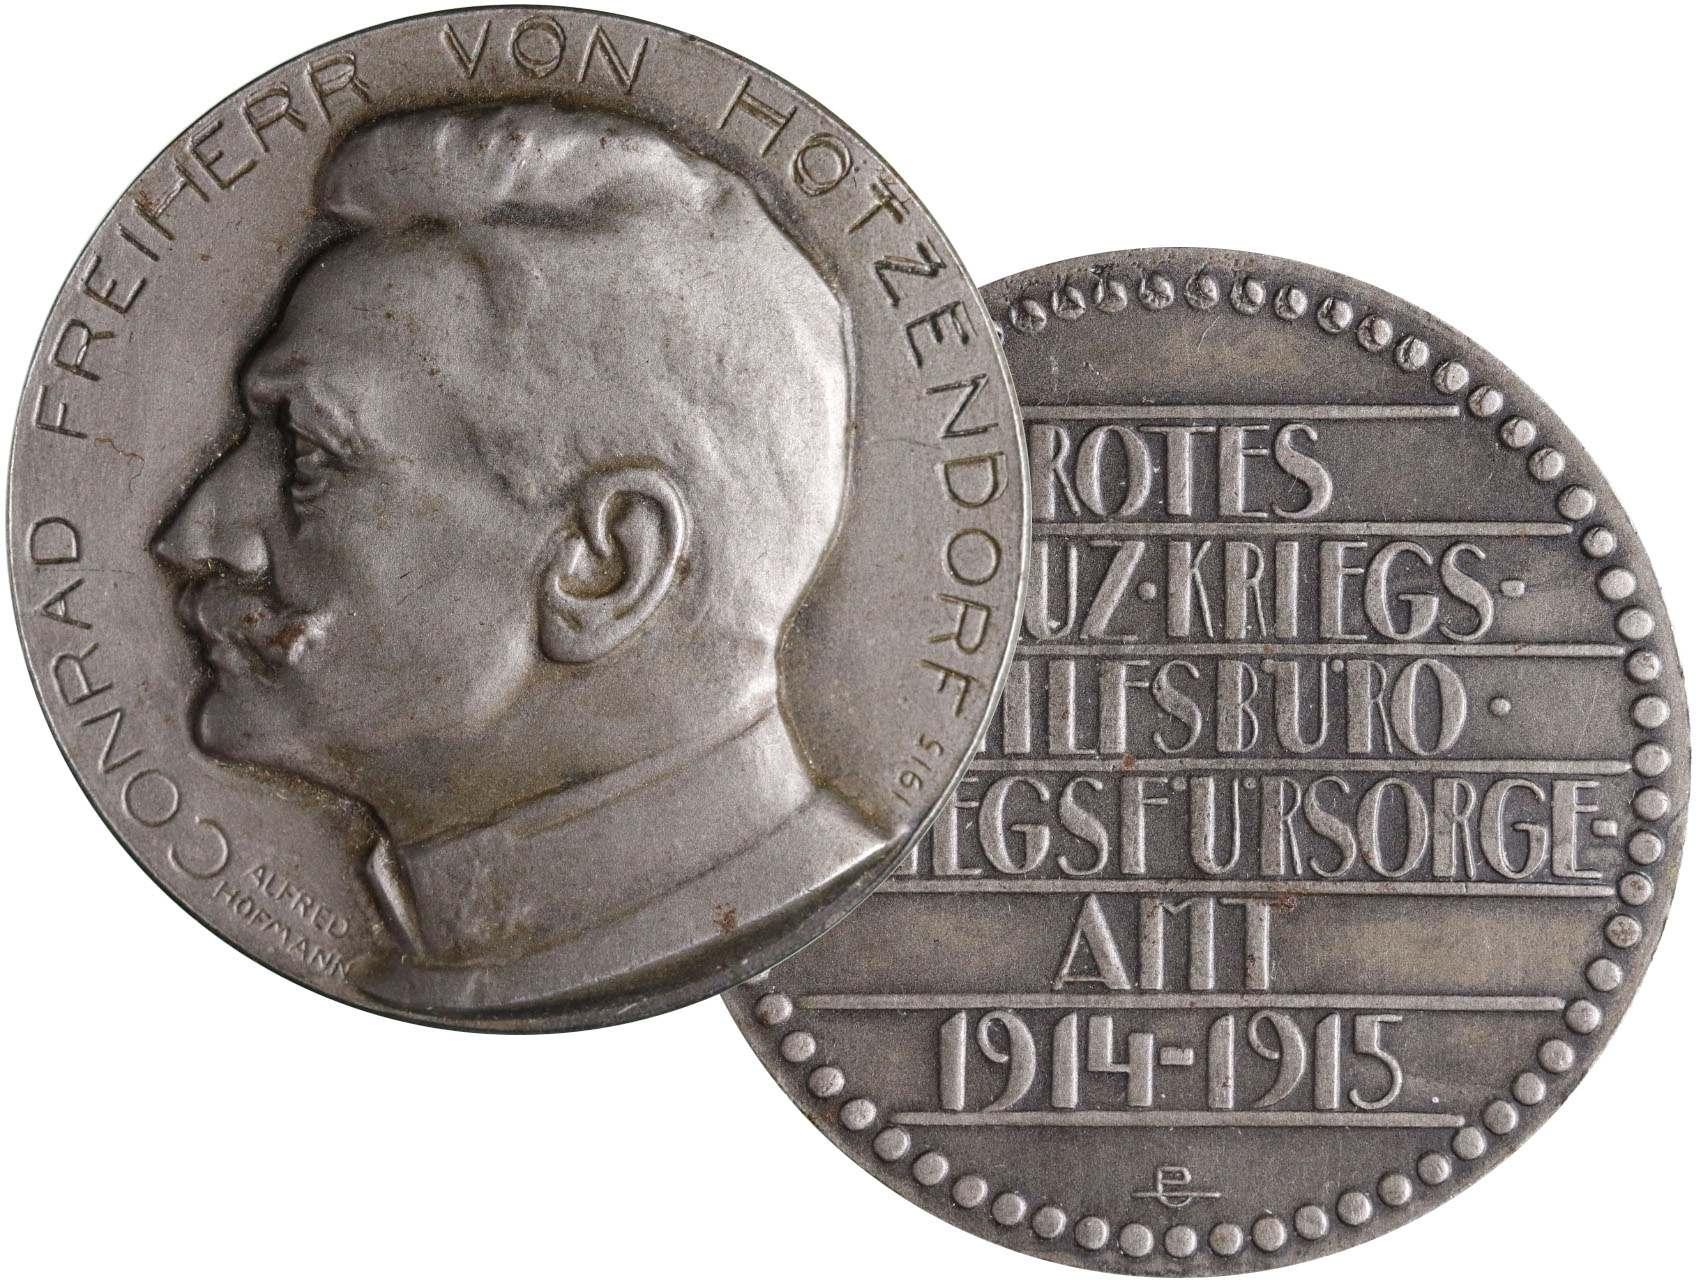 Hofmann Alfred 1879-1968 - AE medaile Conrad Hotzendorf 1915. Portrét zleva, opis / text (ROTES KREUZ KRIEGS HILFSBÜRO KRIEGSFÜRSORGE AMT 1914-1915). Zinek 45 mm